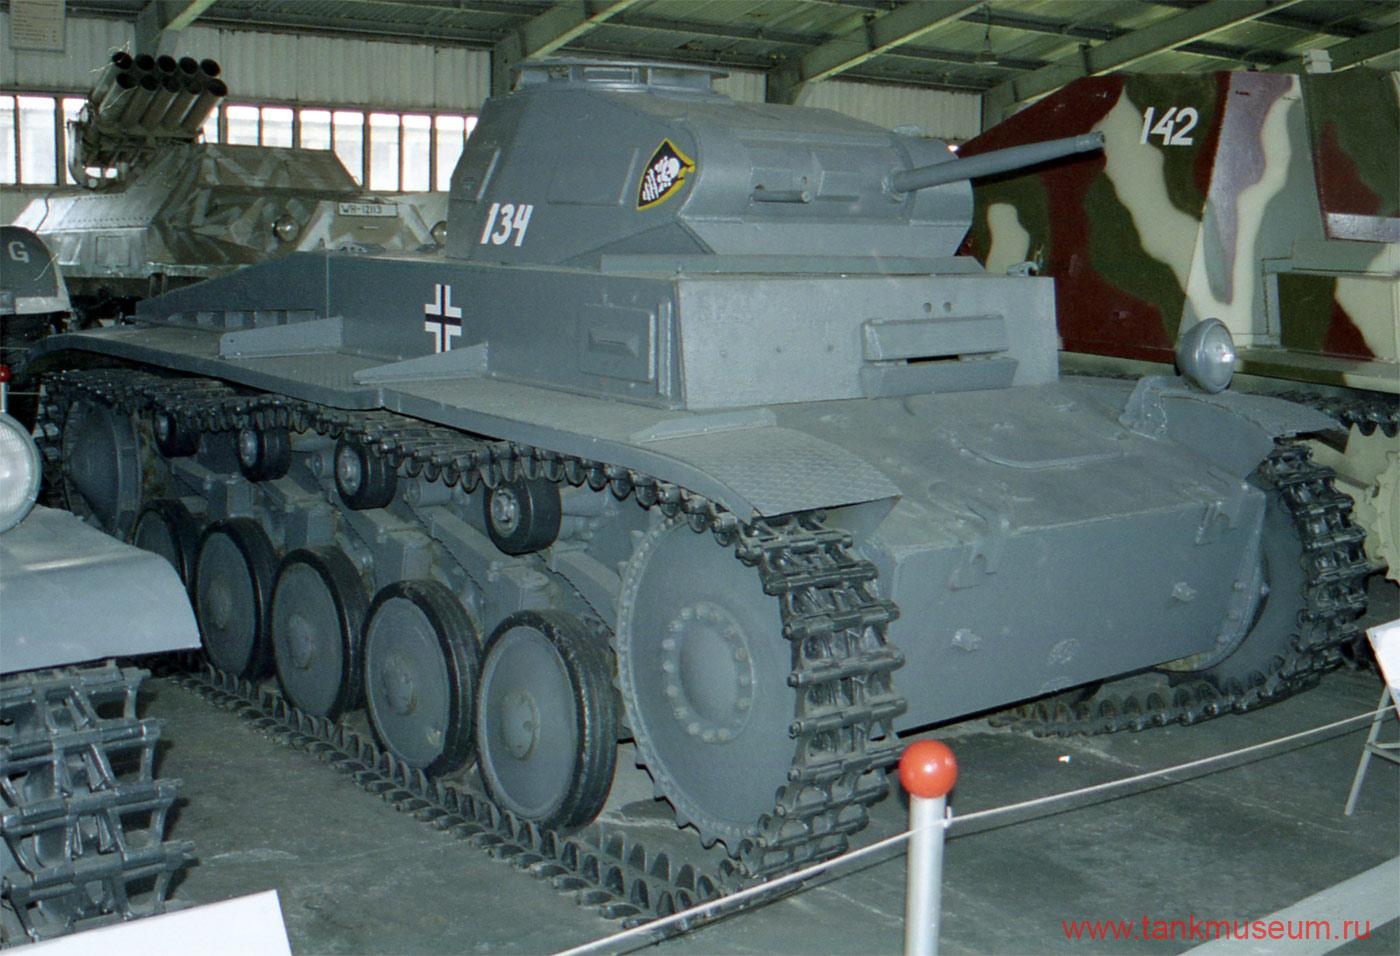 Немецкий легкий танк Т-II, Kubinka